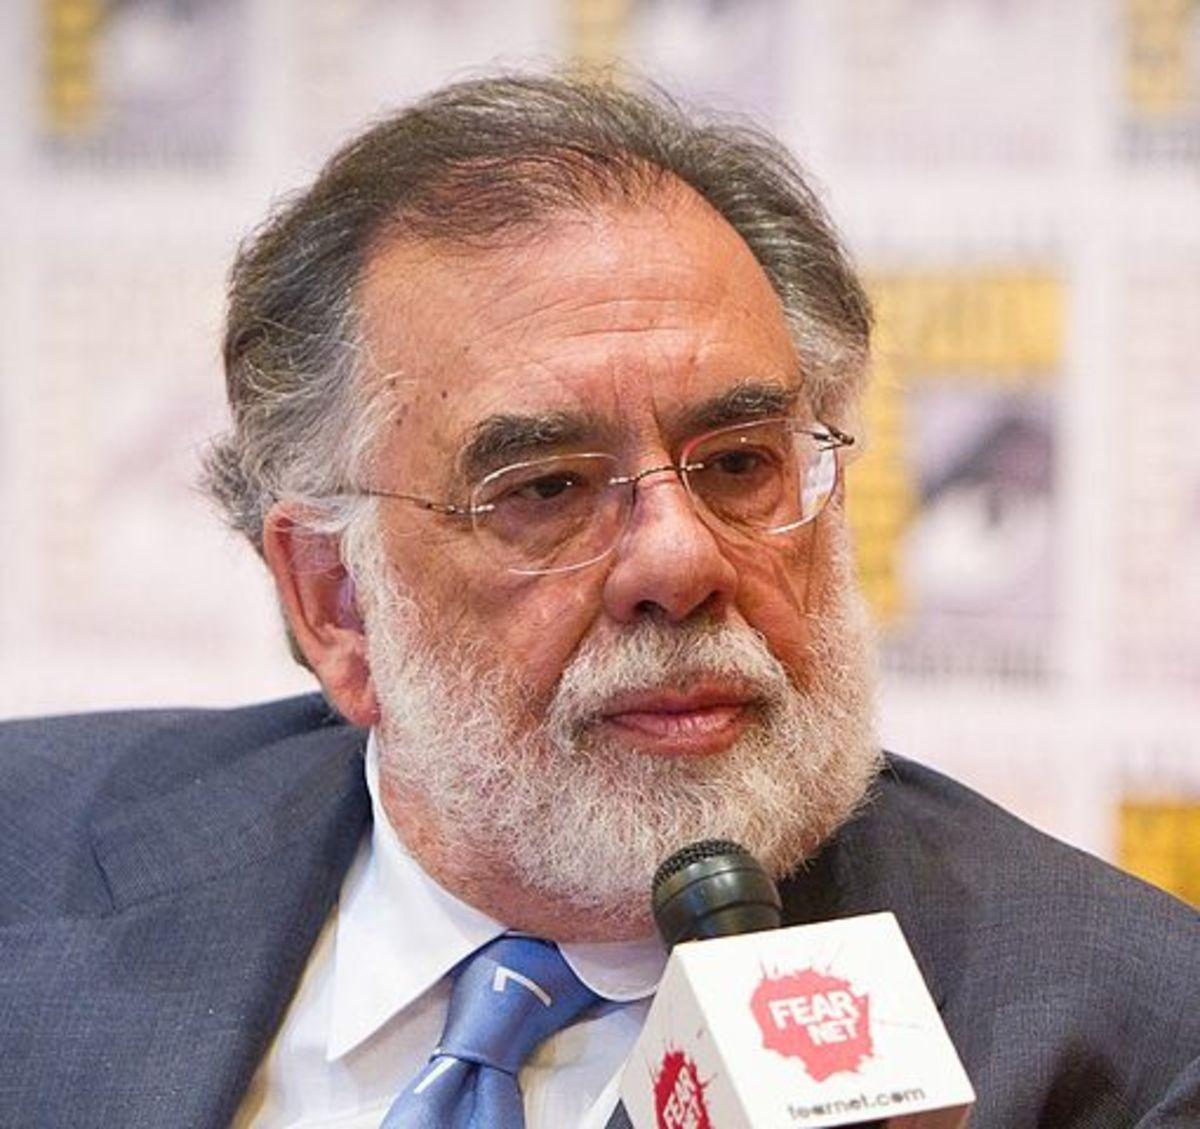 Francis Ford Coppola (2011)